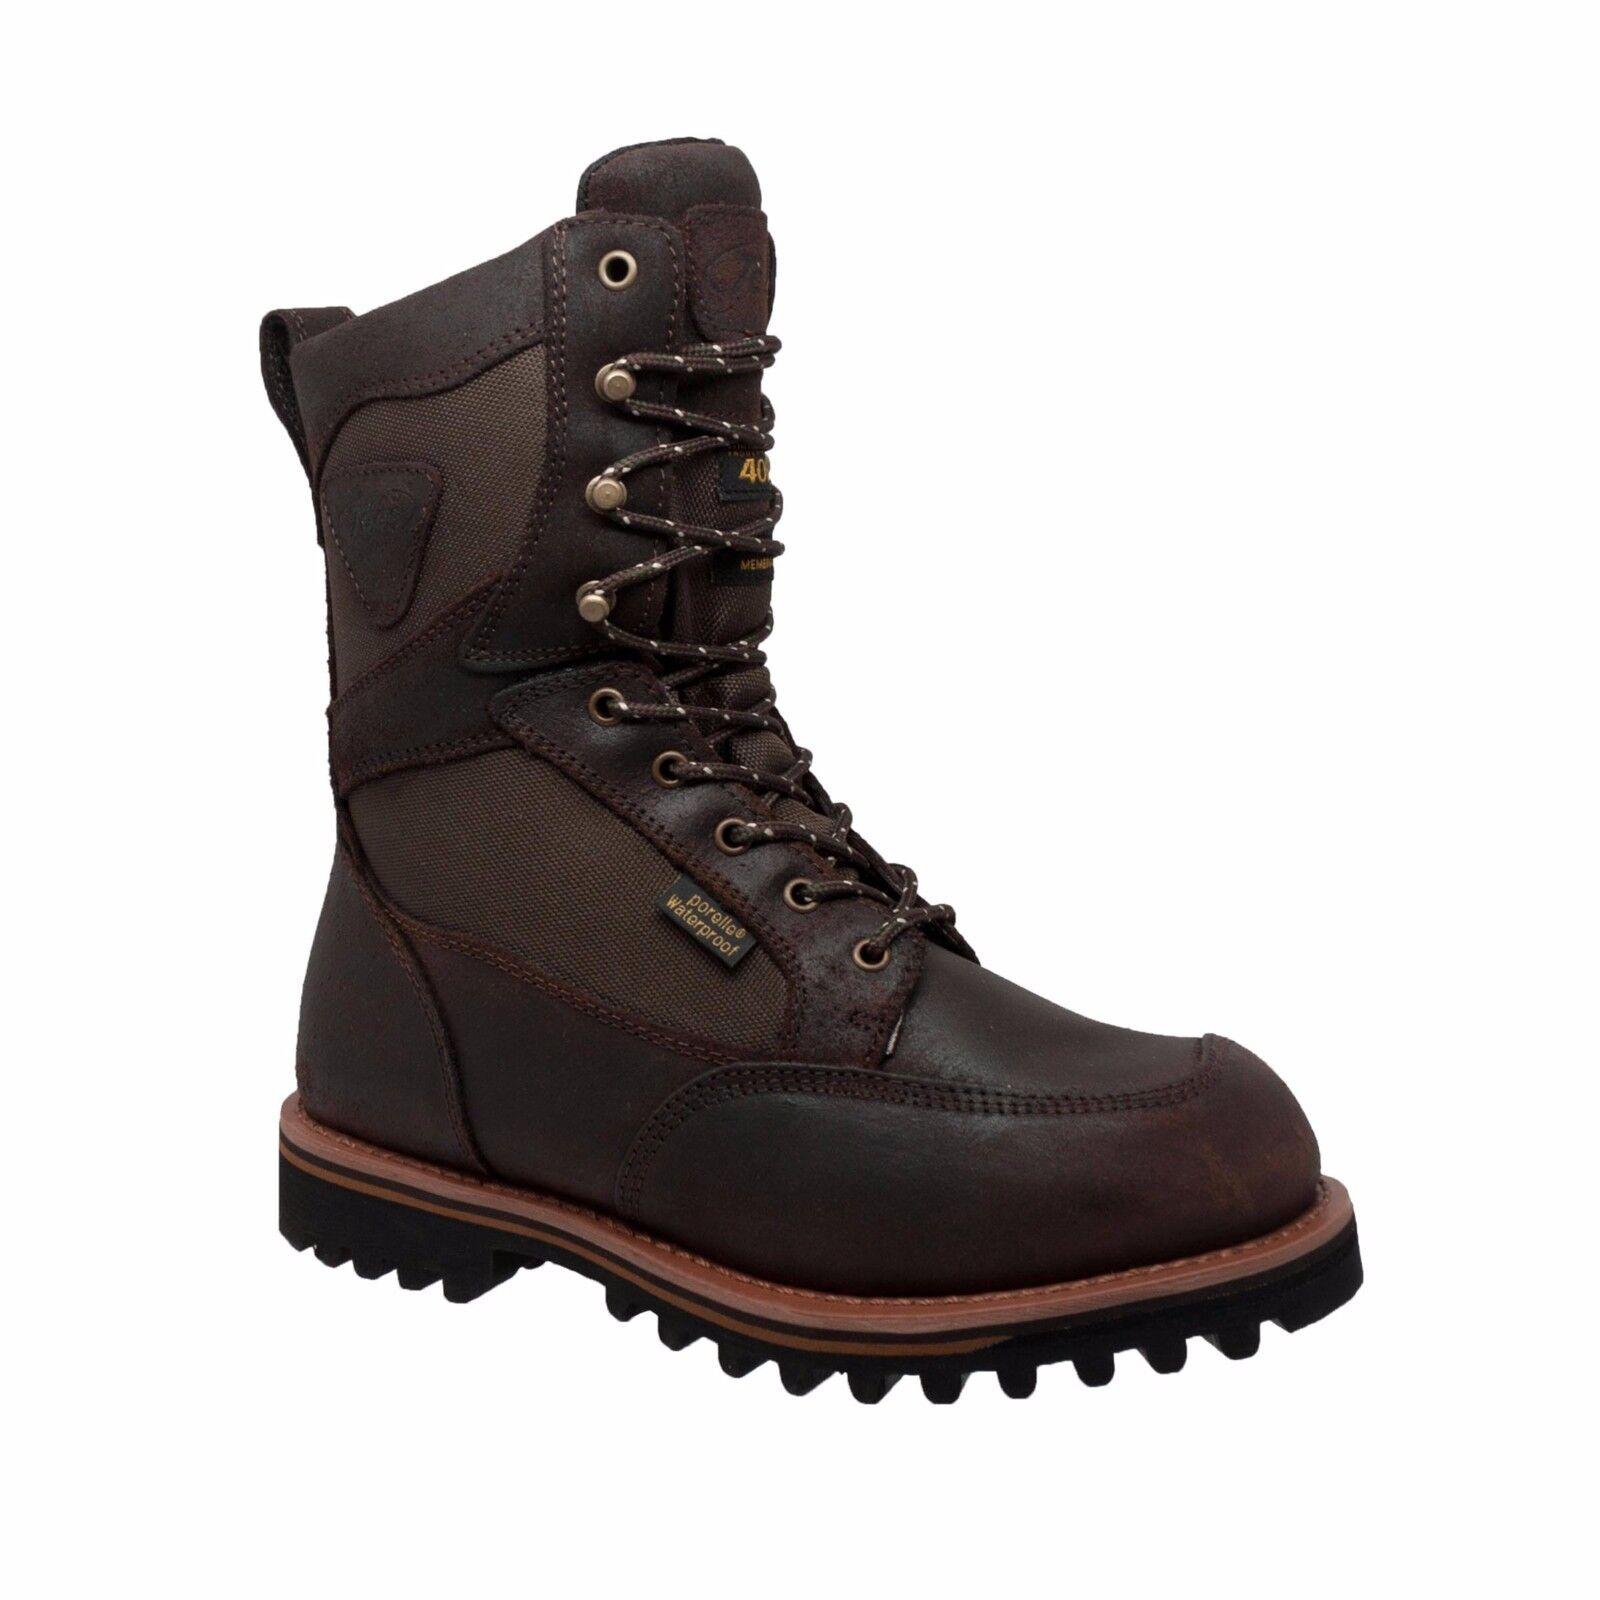 1614 Tecs, 11  Cordura, Waterproof, Men's Hunting Boots